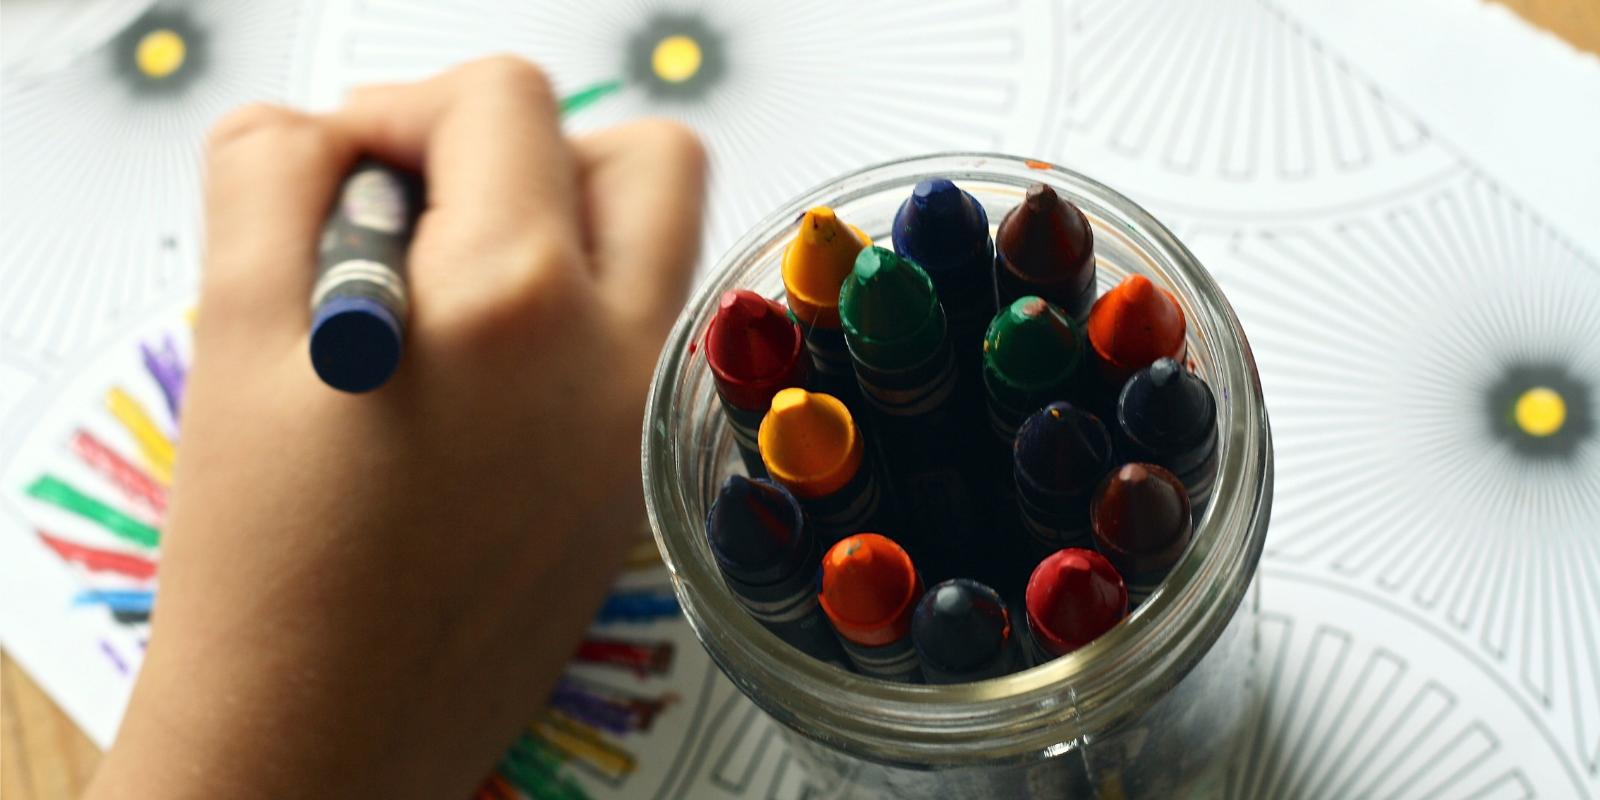 Life As A Coloring Book